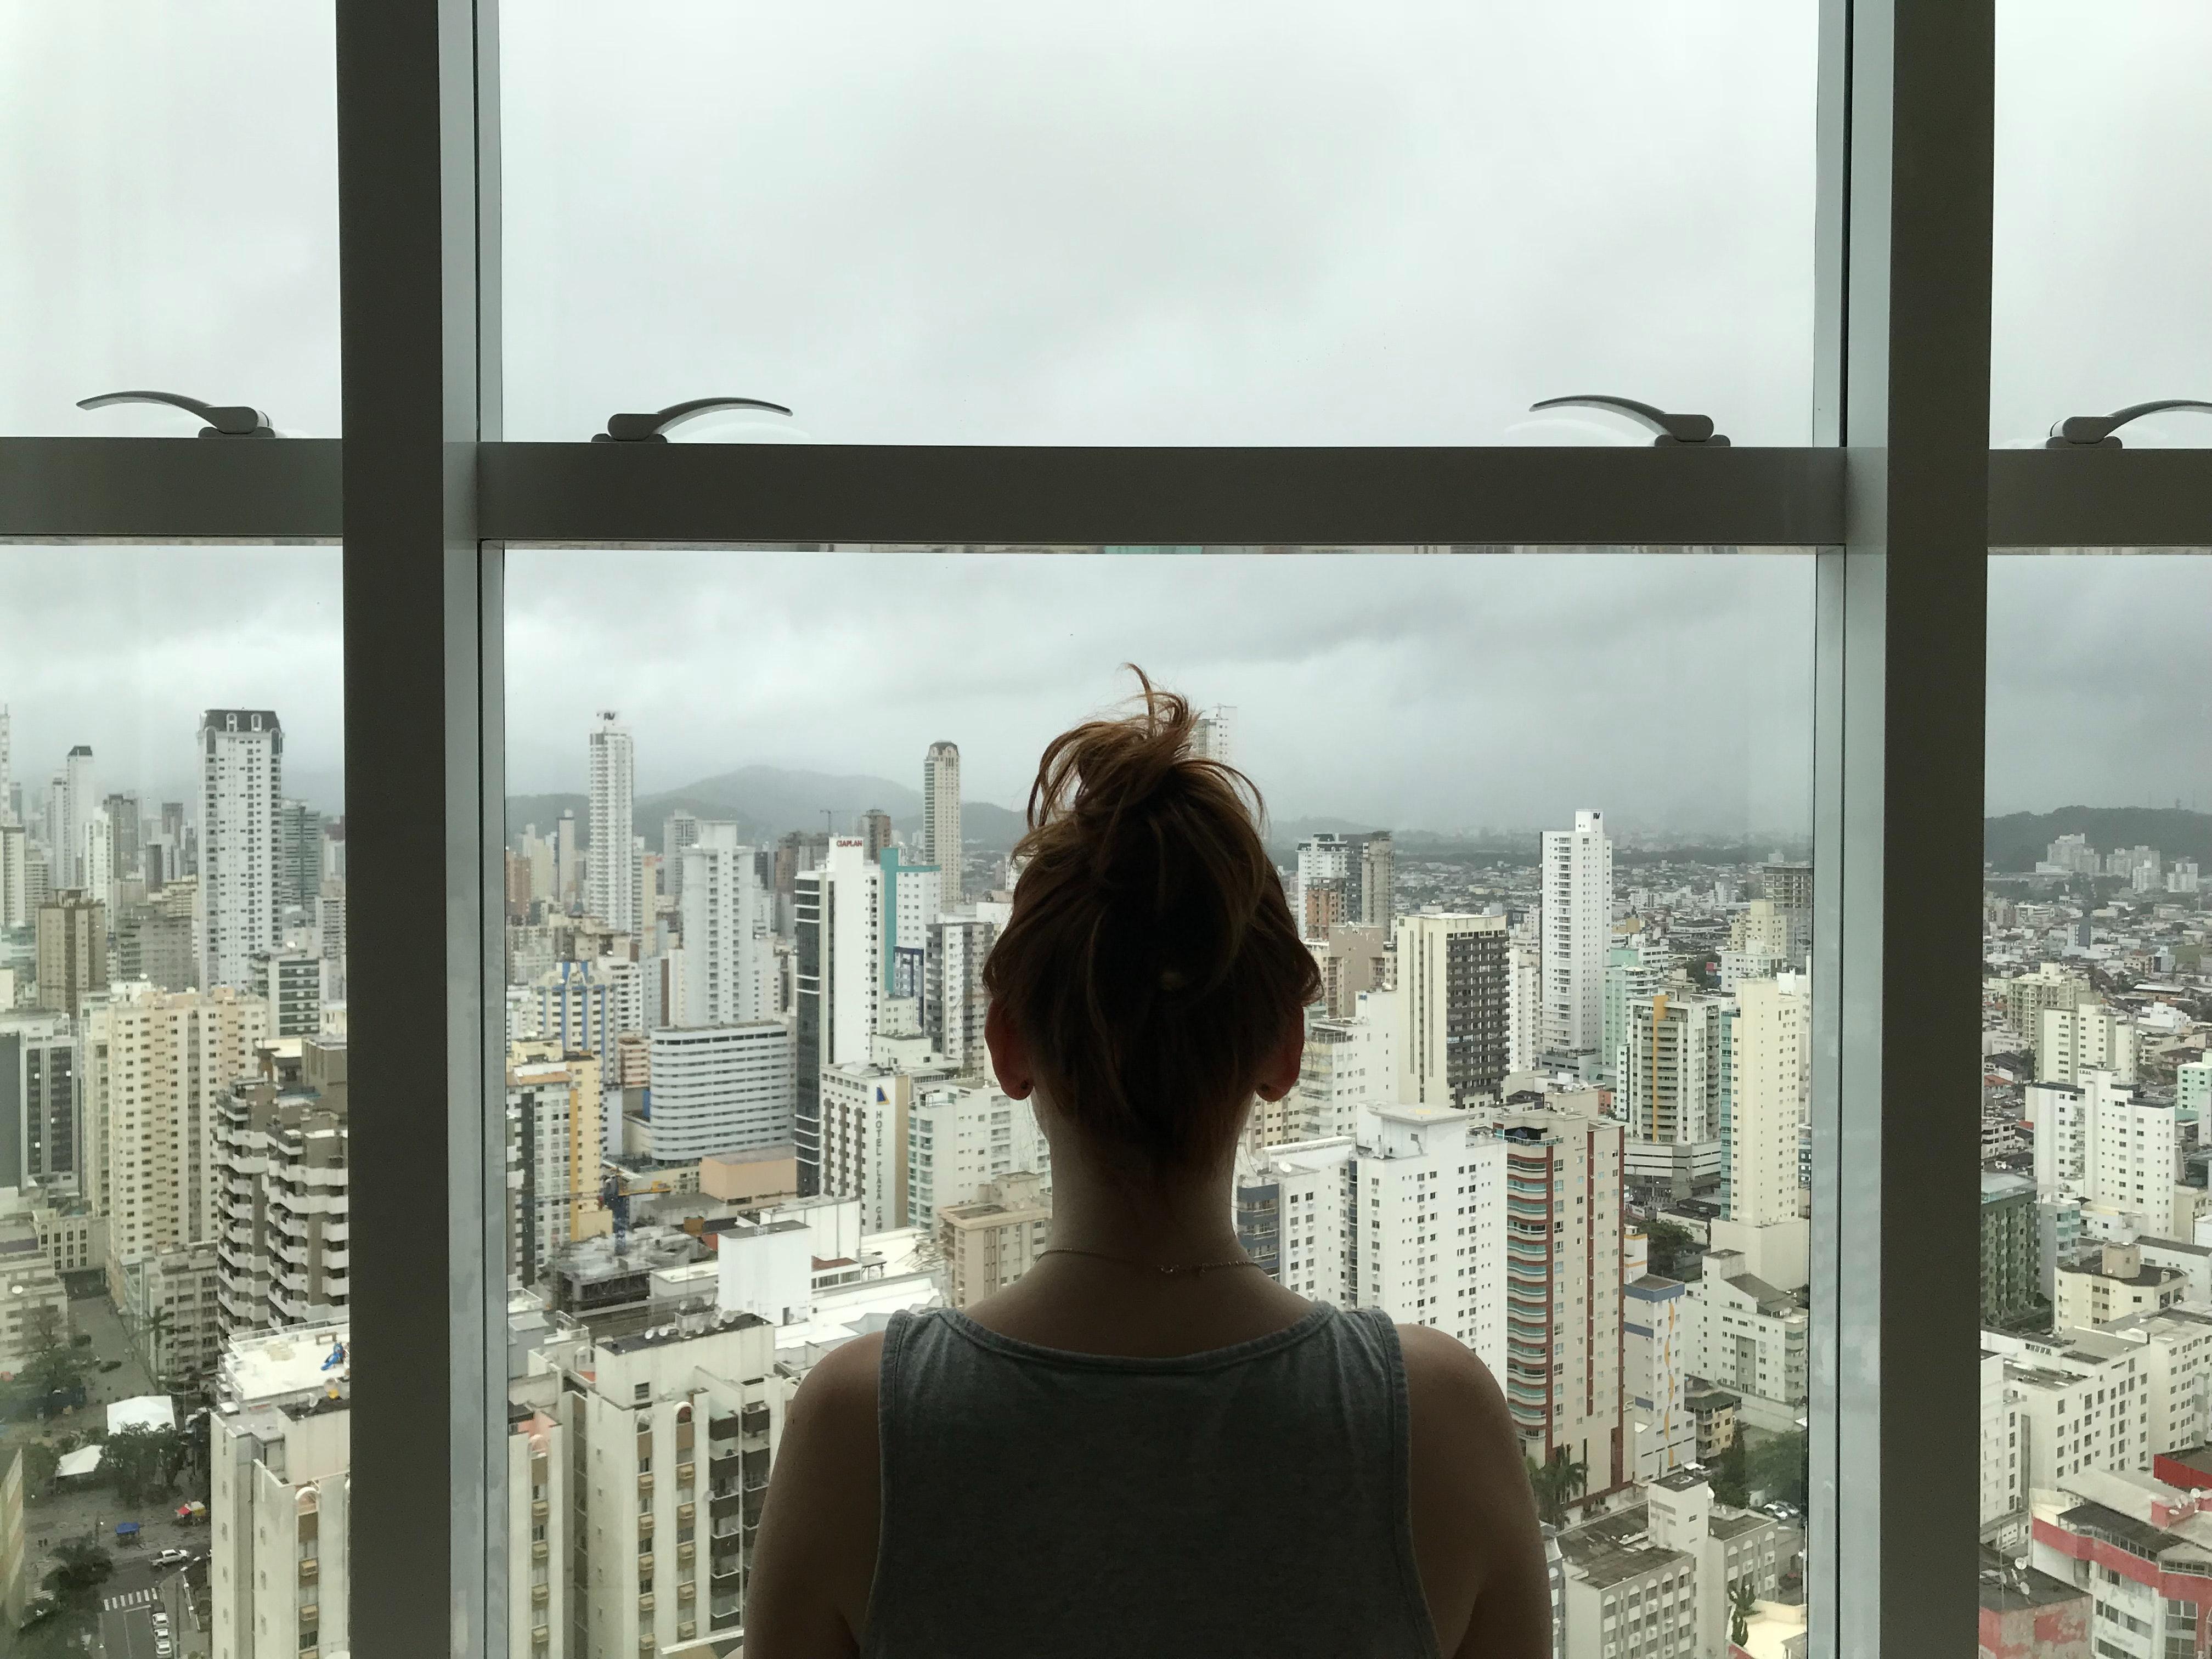 Woman standing near glass window photo